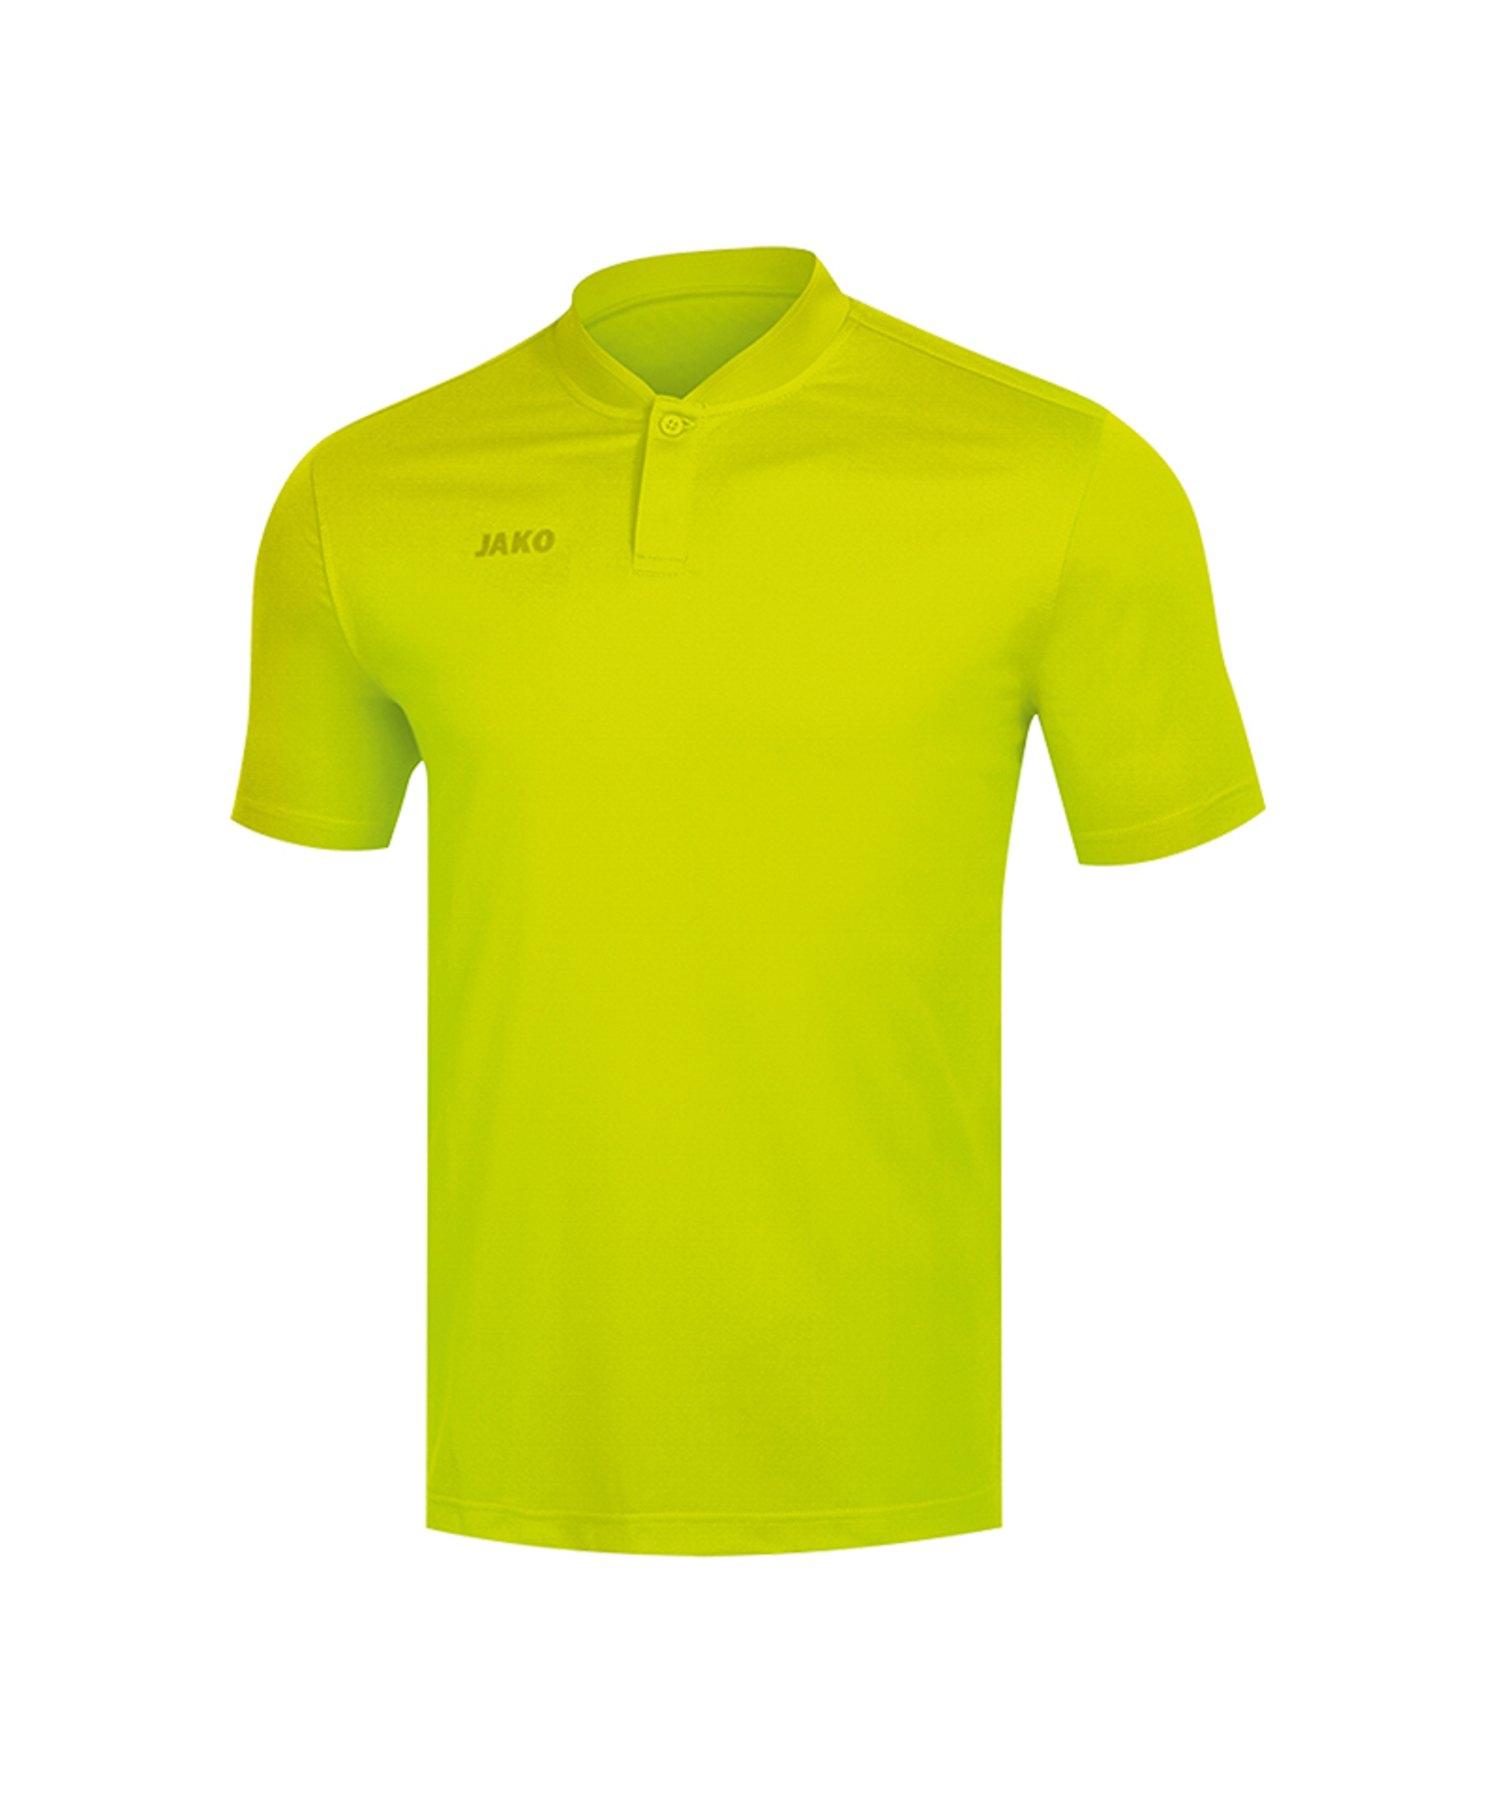 Jako Prestige Poloshirt Gelb F32 - Gelb